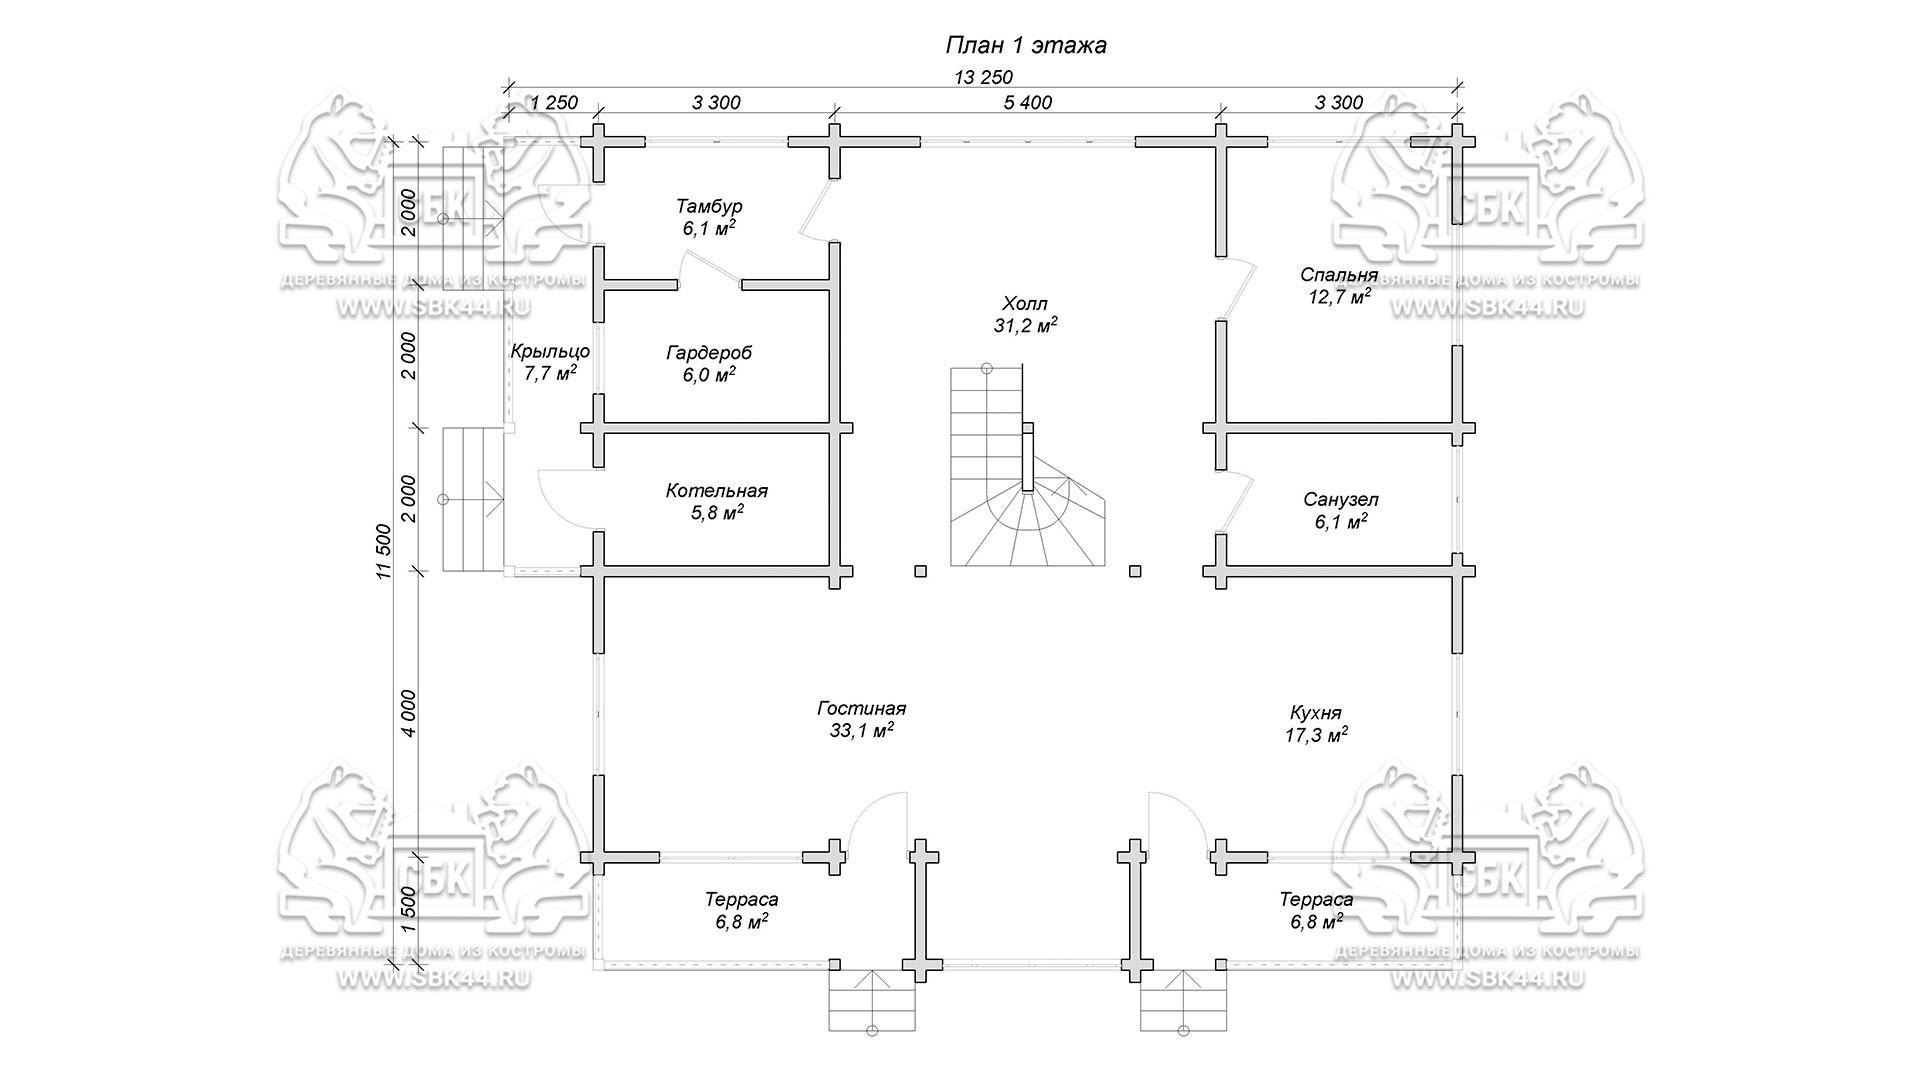 Проект дома из бруса в чашу 12 х 11,5 м «Семейный» - план 1-го этажа